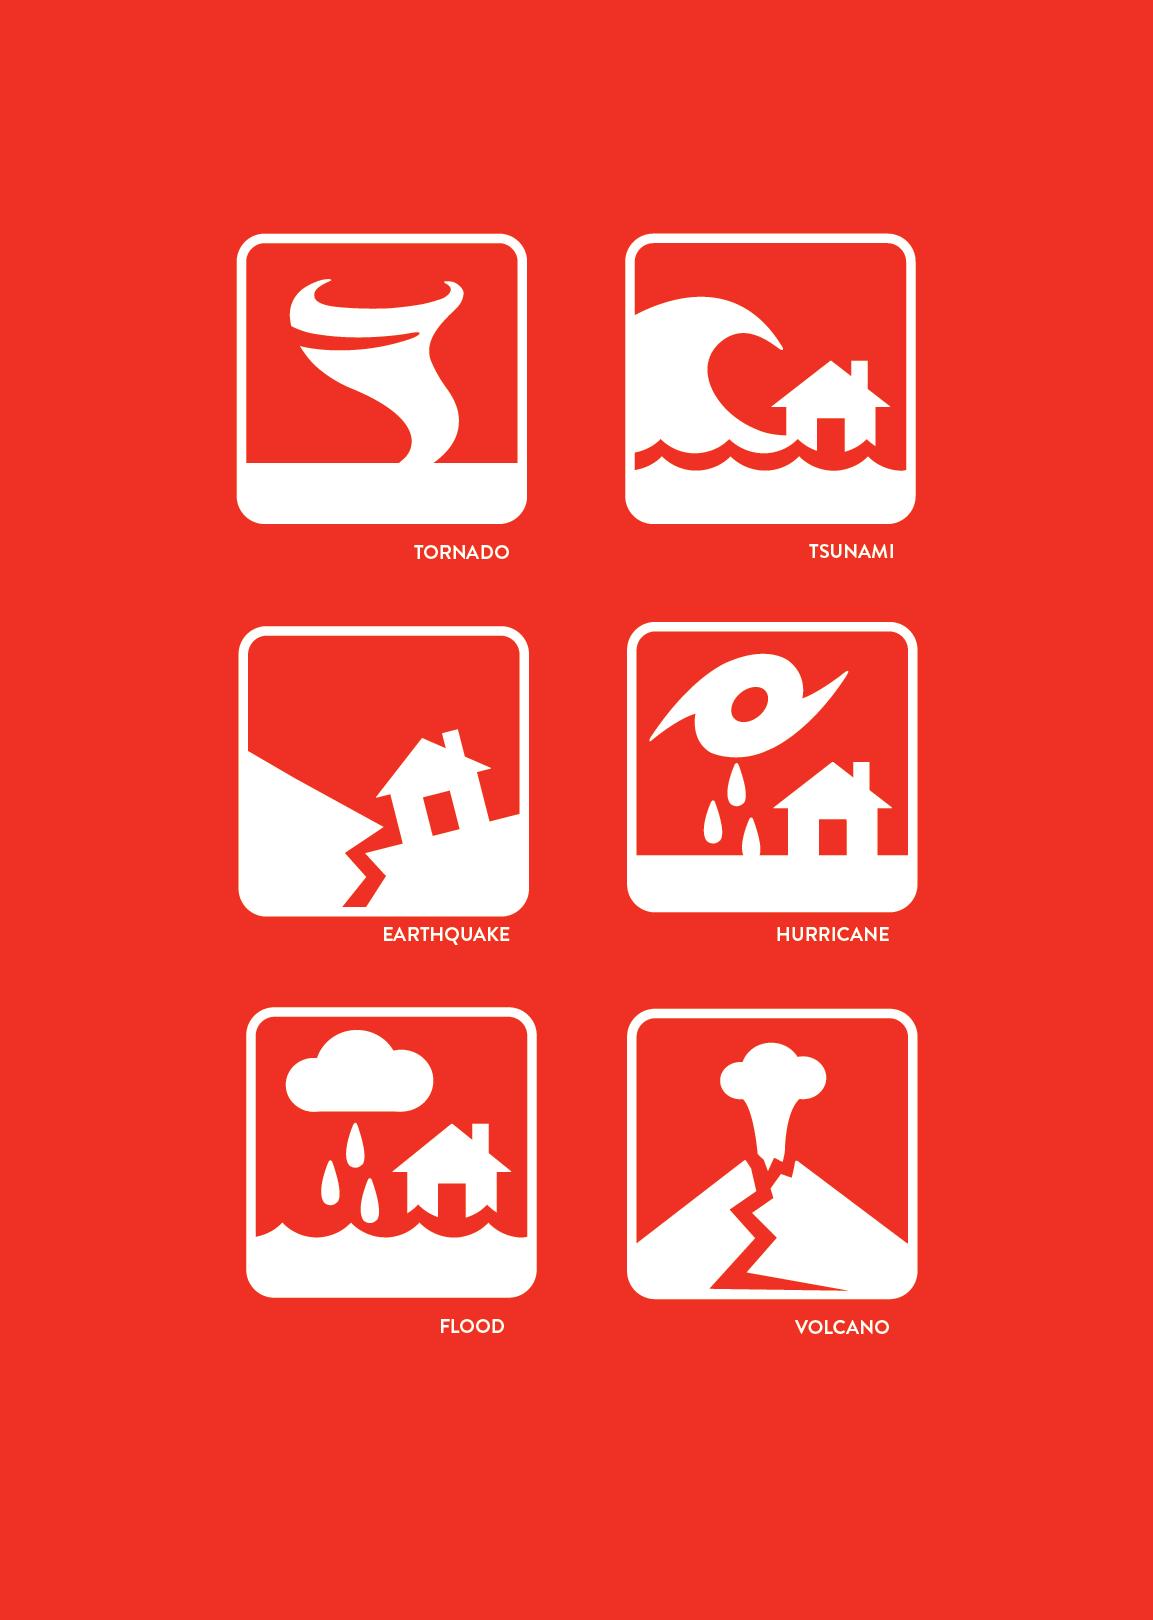 naturaldisaster_poster_red.png